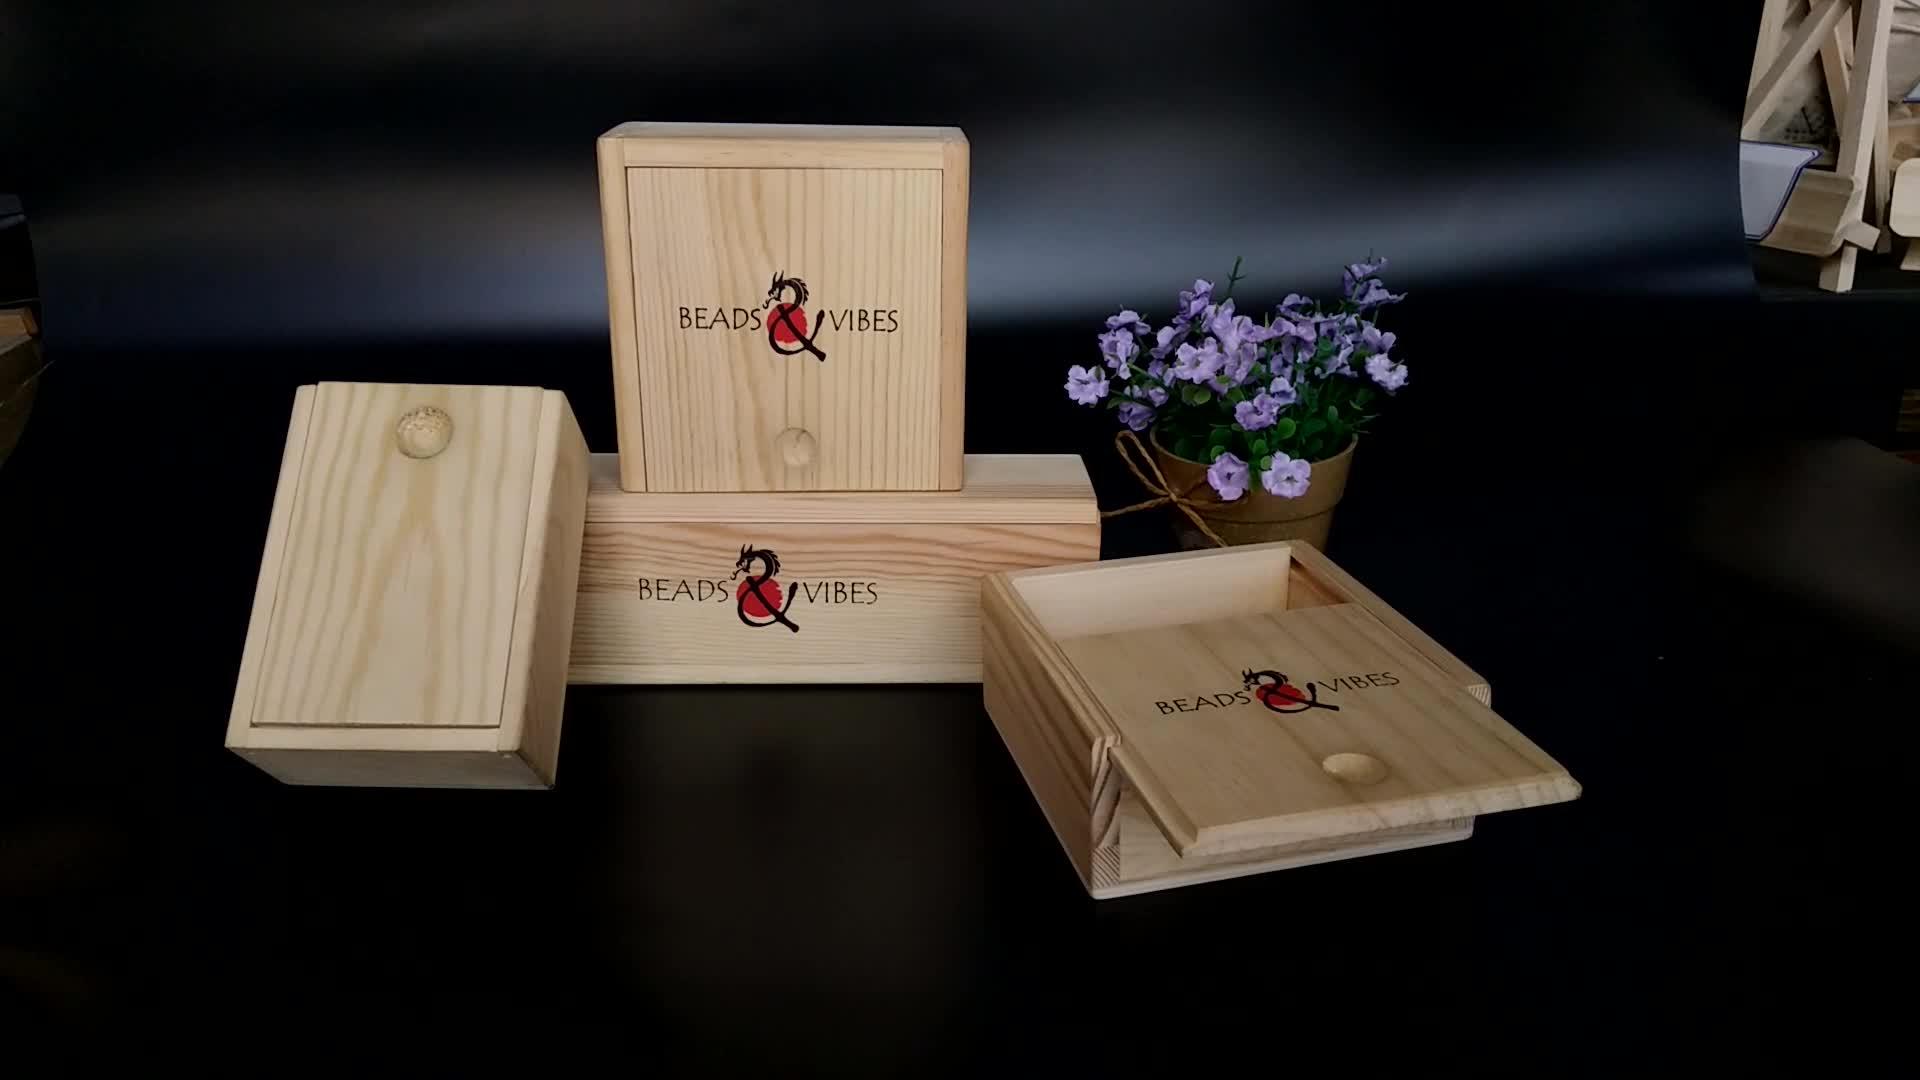 पैन सस्ते लकड़ी के बॉक्स कस्टम लोगो पैकेजिंग छोटे फिसलने ढक्कन उपहार लकड़ी चाय बॉक्स